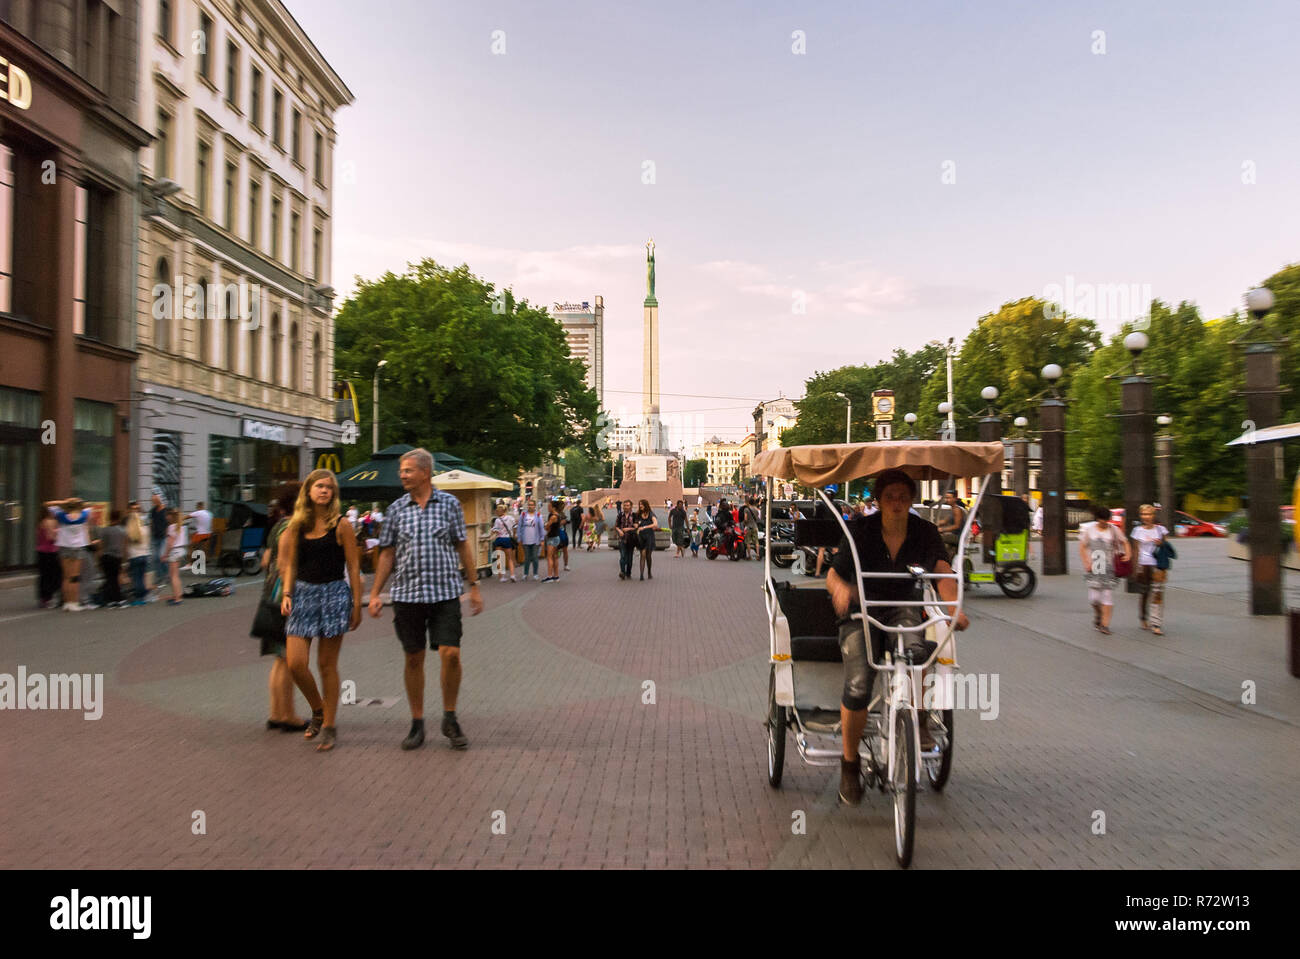 Kaļķu iela street with Freedom Monument, Riga, Latvia - Stock Image